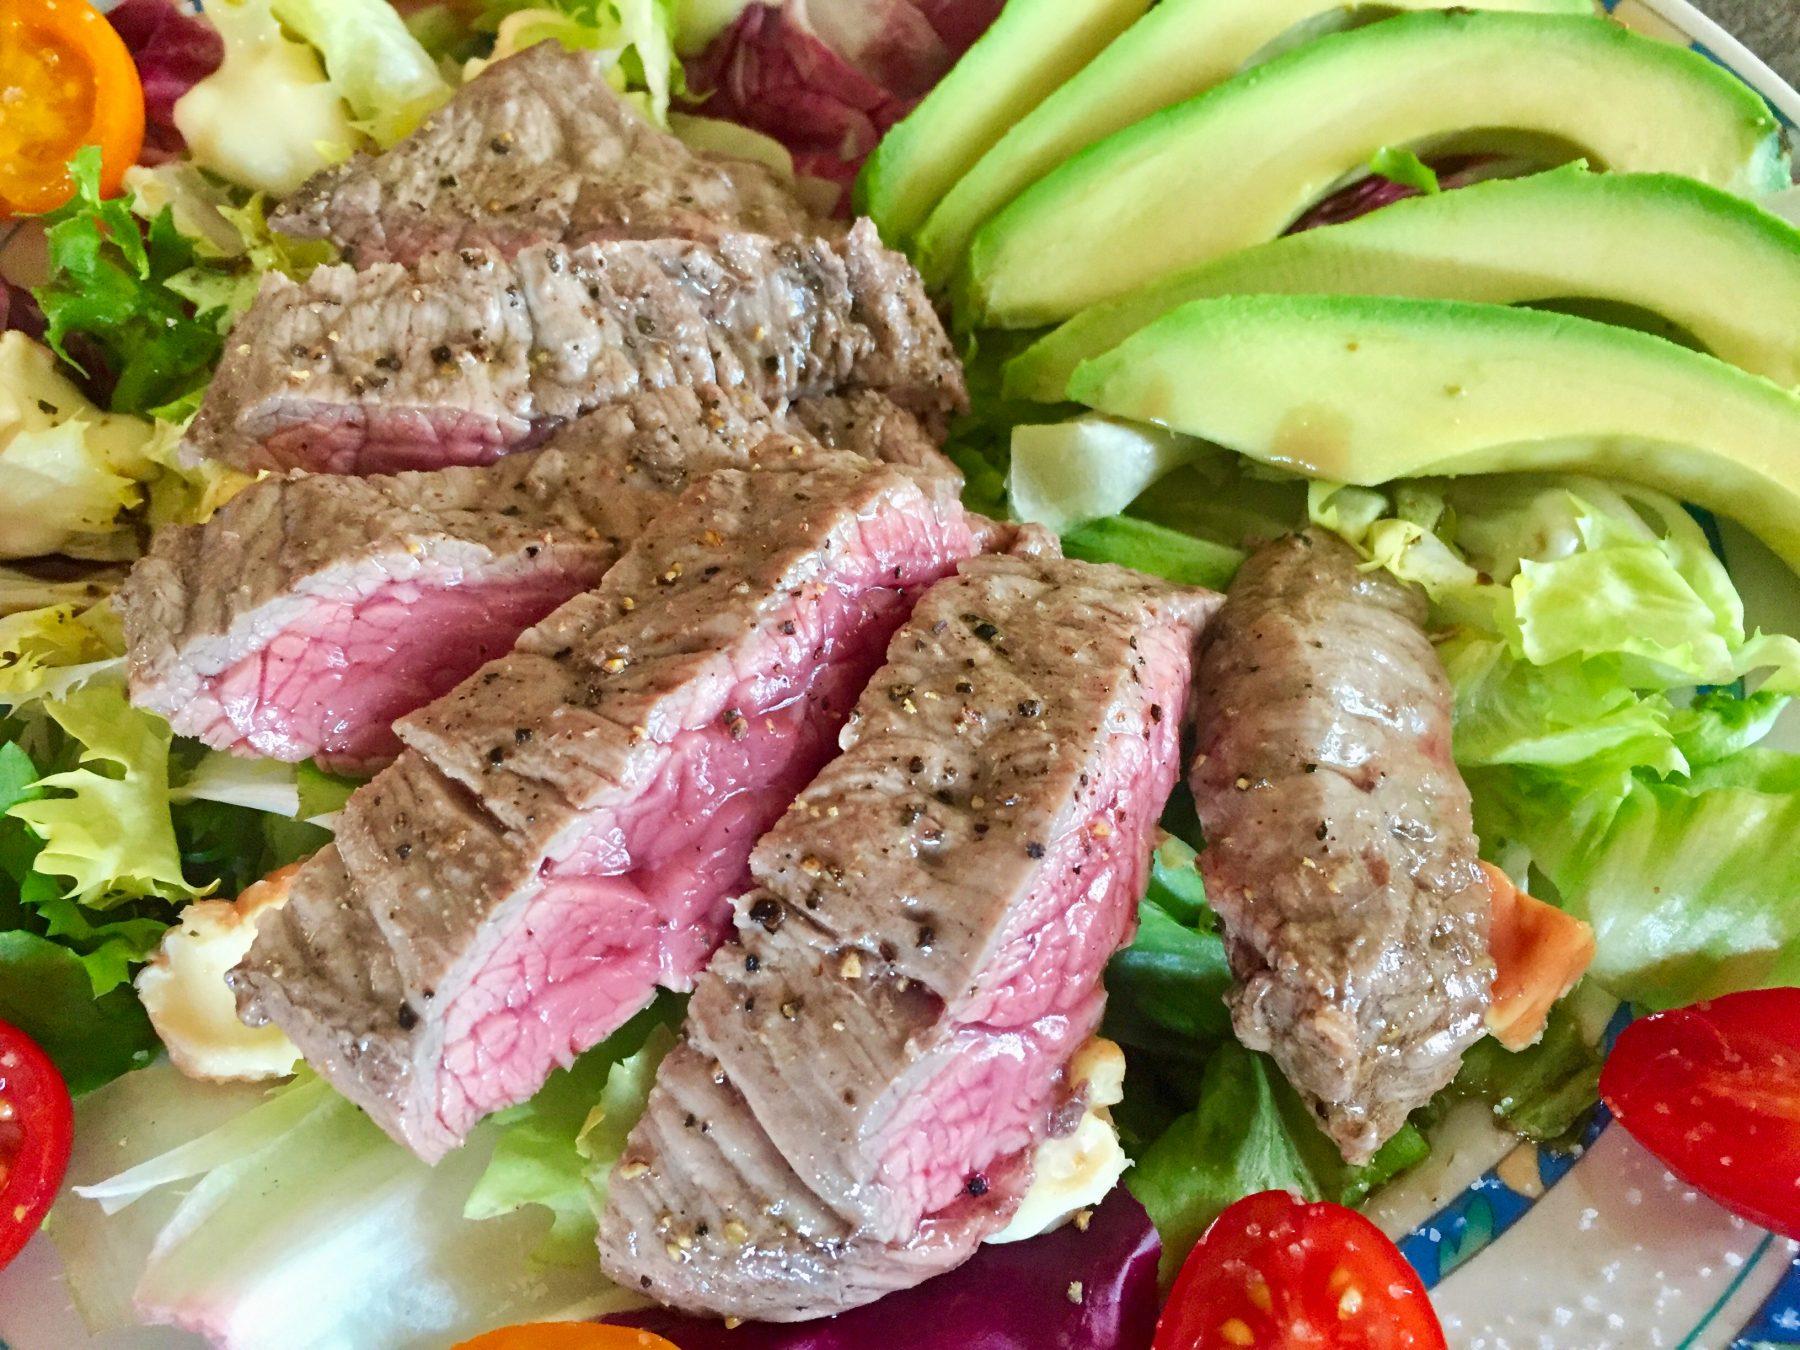 IMG 3499 - Salade boeuf, époisses, tomates et avocat